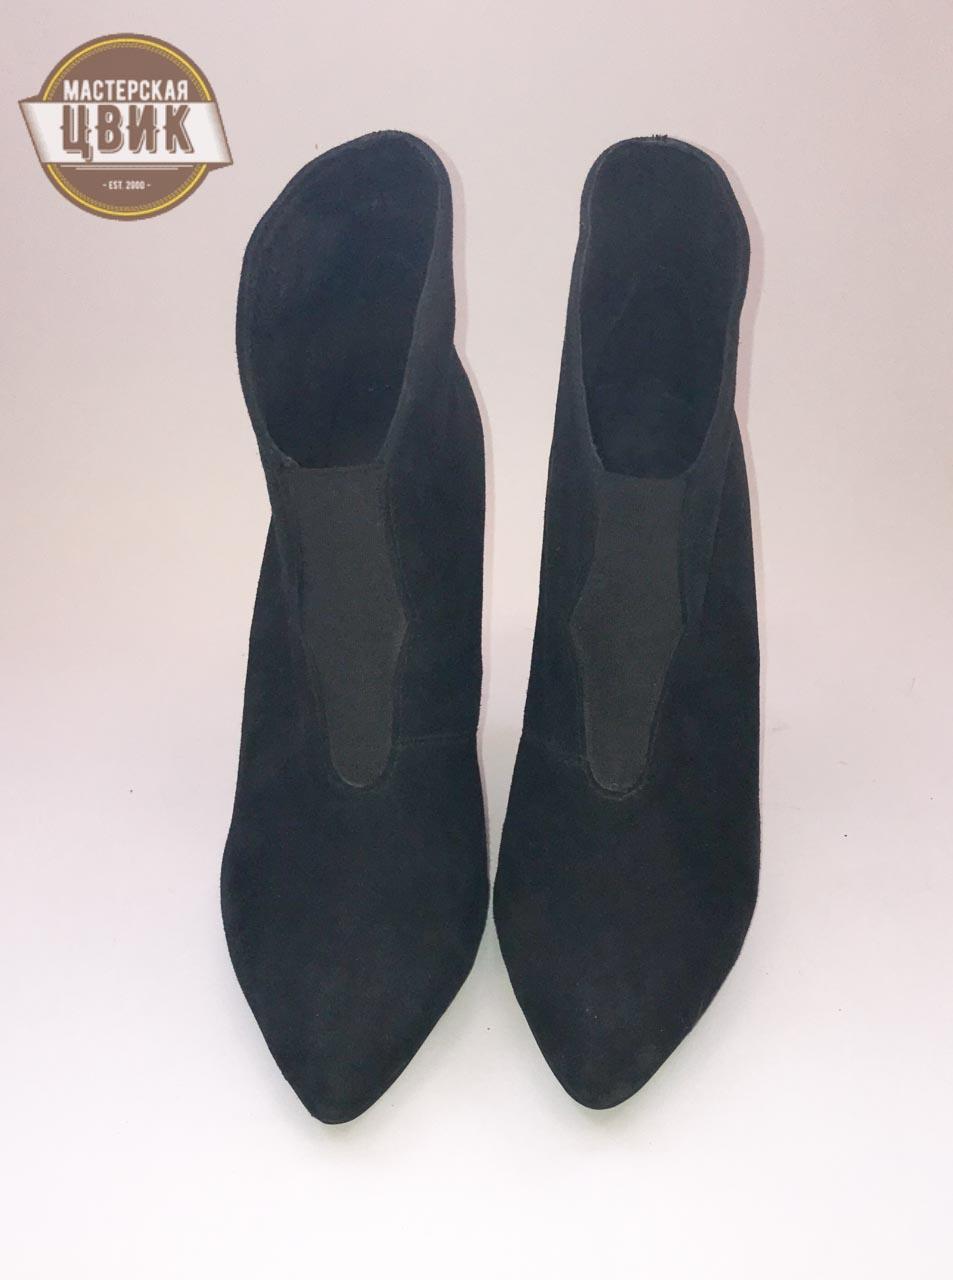 individualnyj-poshiv-obuvi-minsk-47 Индивидуальный пошив обуви Минск-47